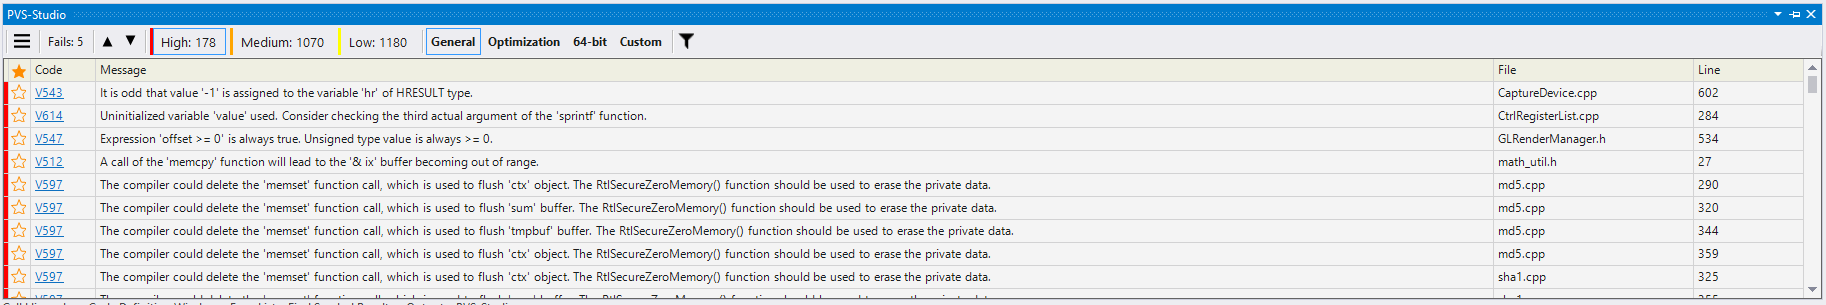 https://import.viva64.com/docx/blog/0753_How_to_integrate_SA/image6.png